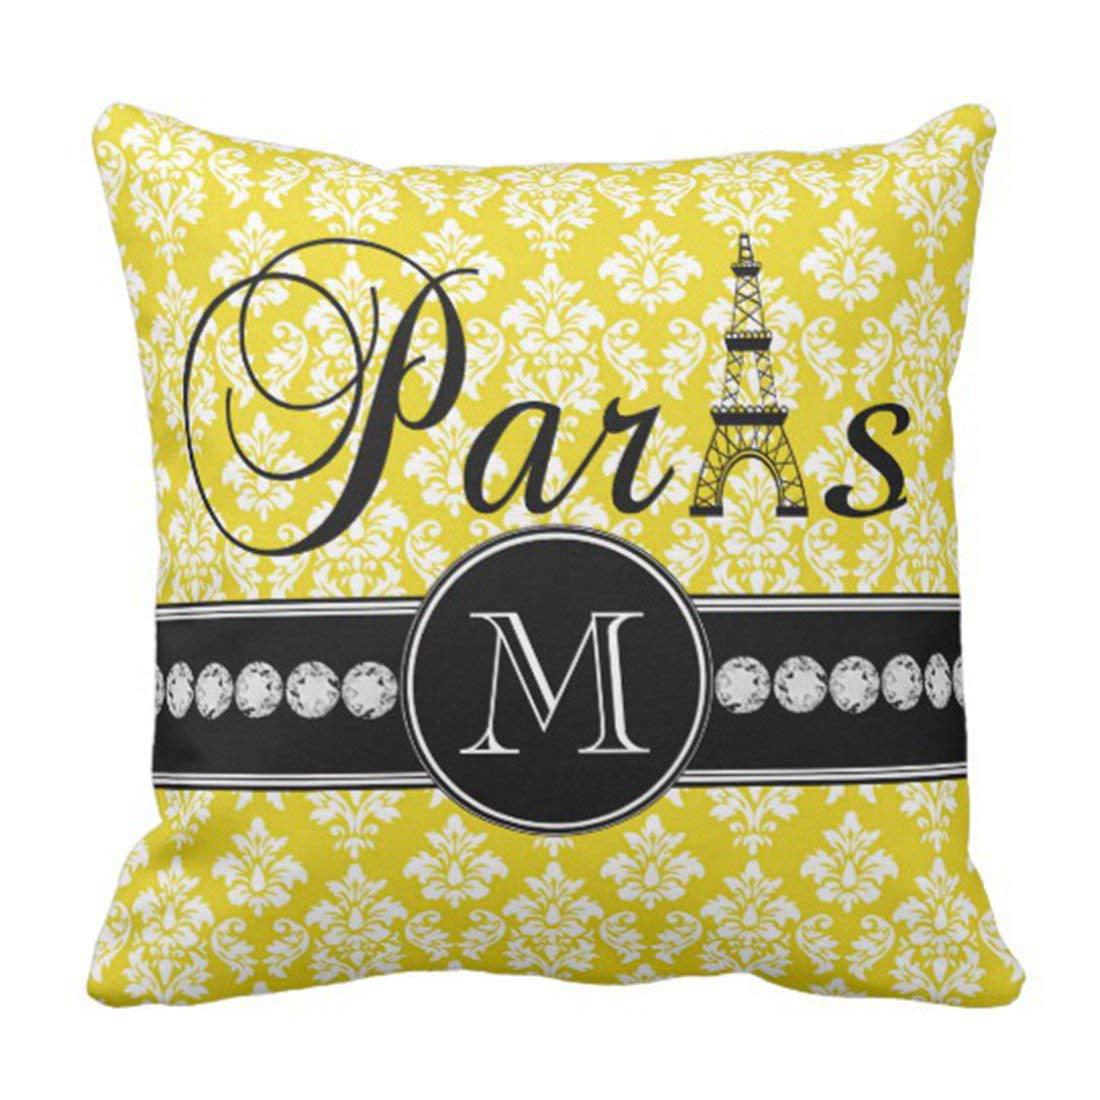 BPBOP Black Monogram Chic Yellow Damask Paris Vintage Pillowcase Cushion Cover 20x20 inches